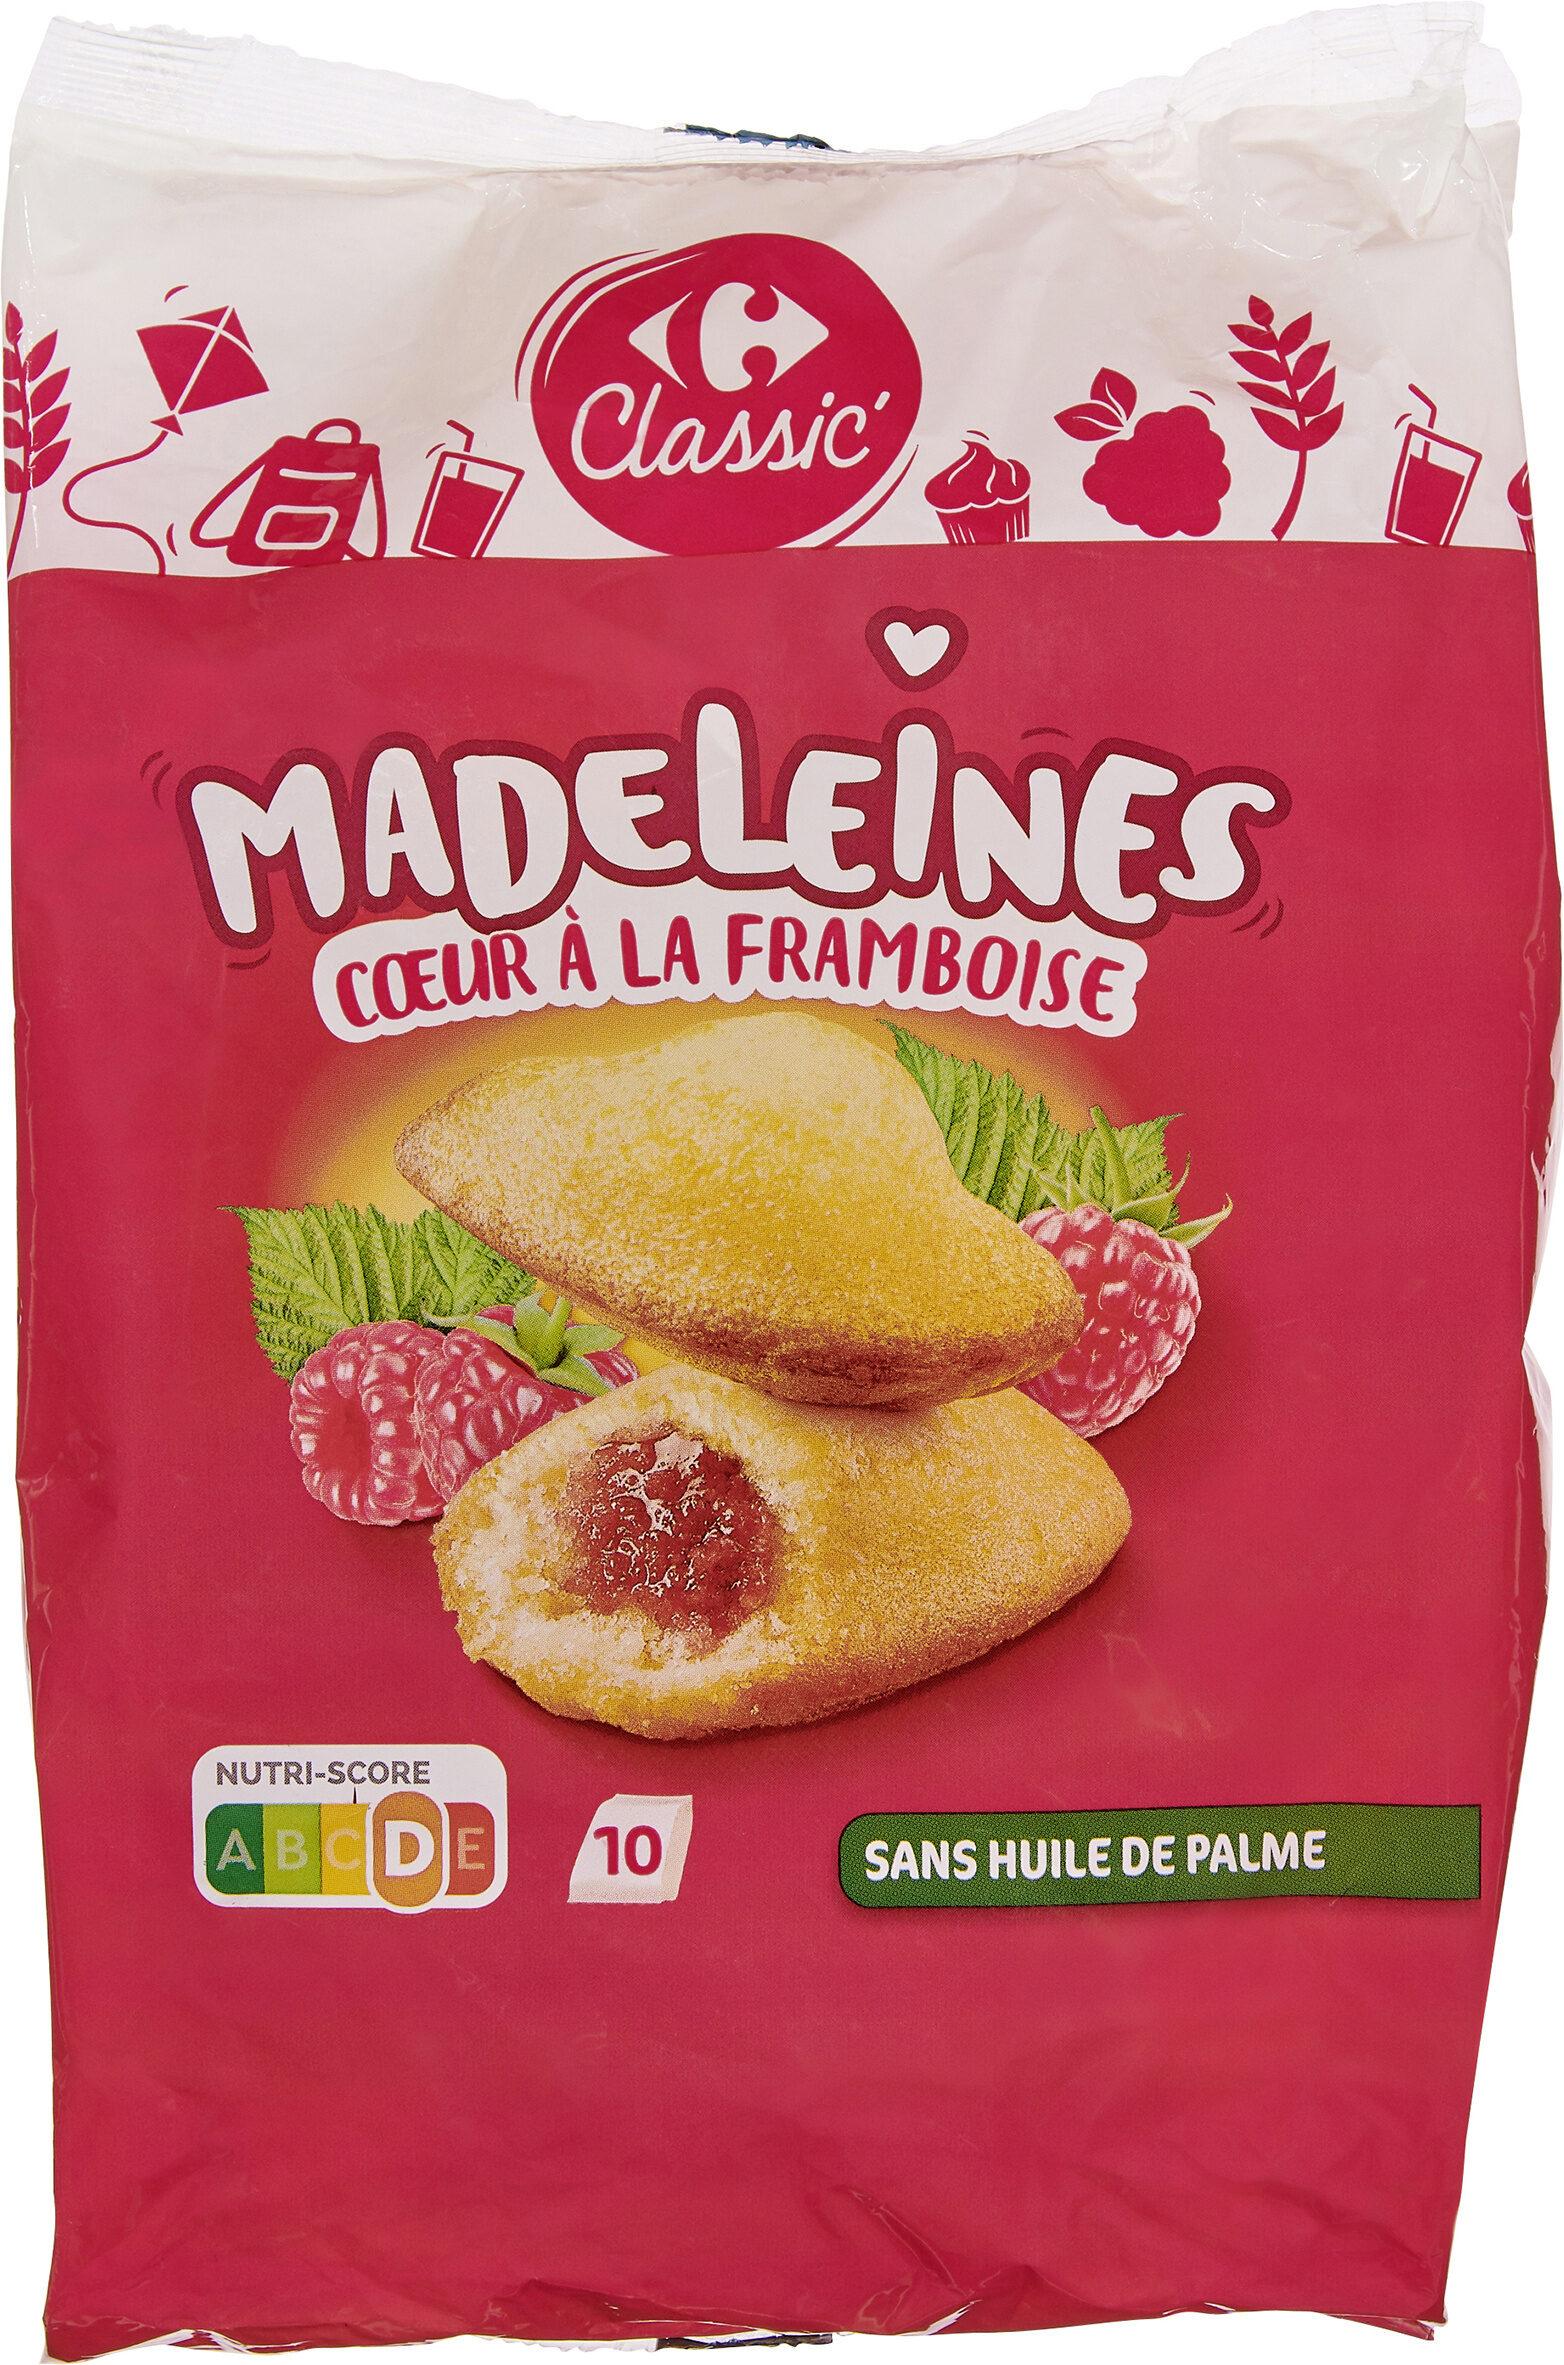 Madeleine coeur de framboise - Produit - fr